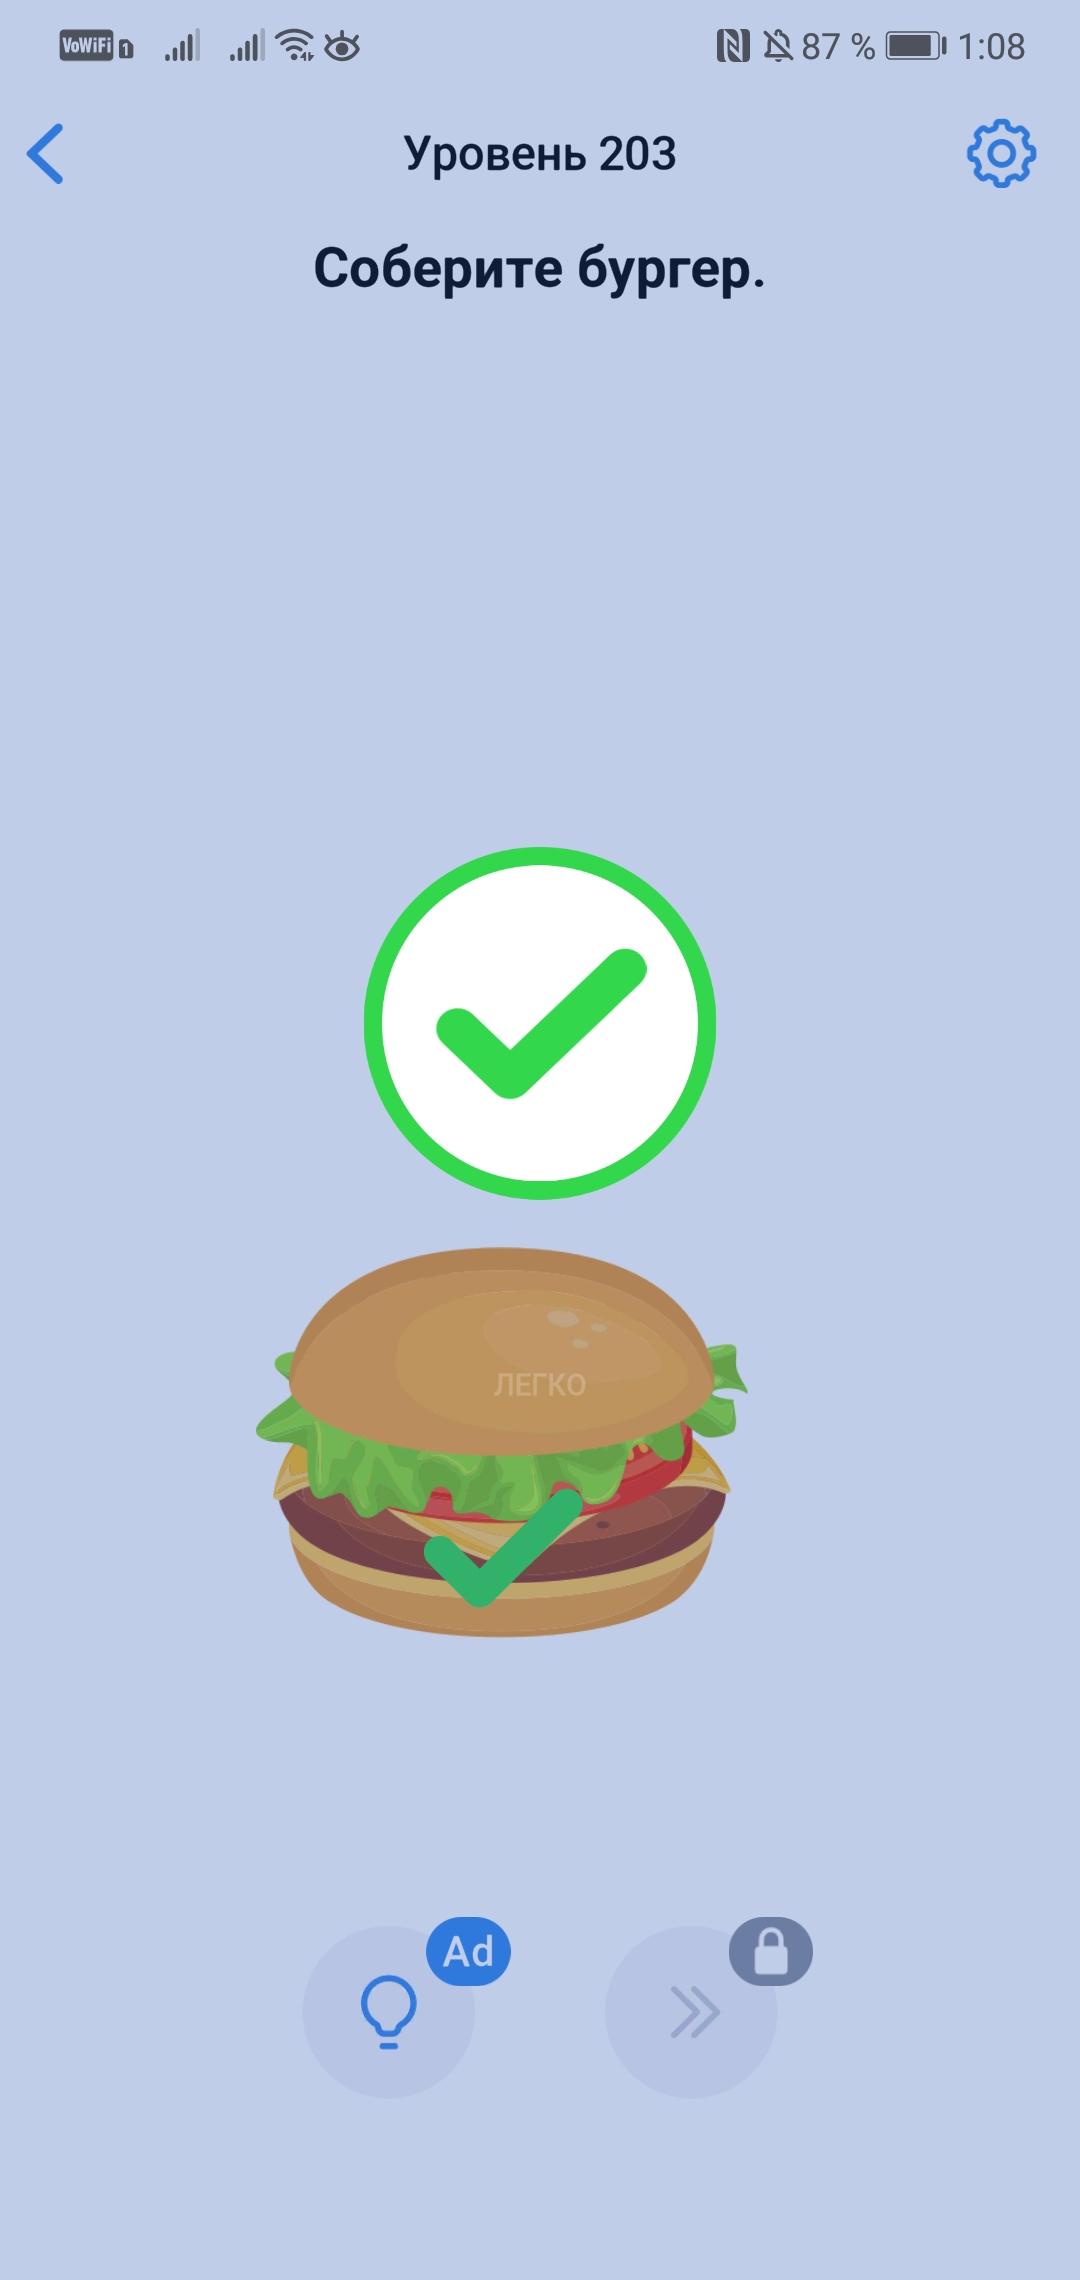 Easy Game - 203 уровень - Соберите бургер.